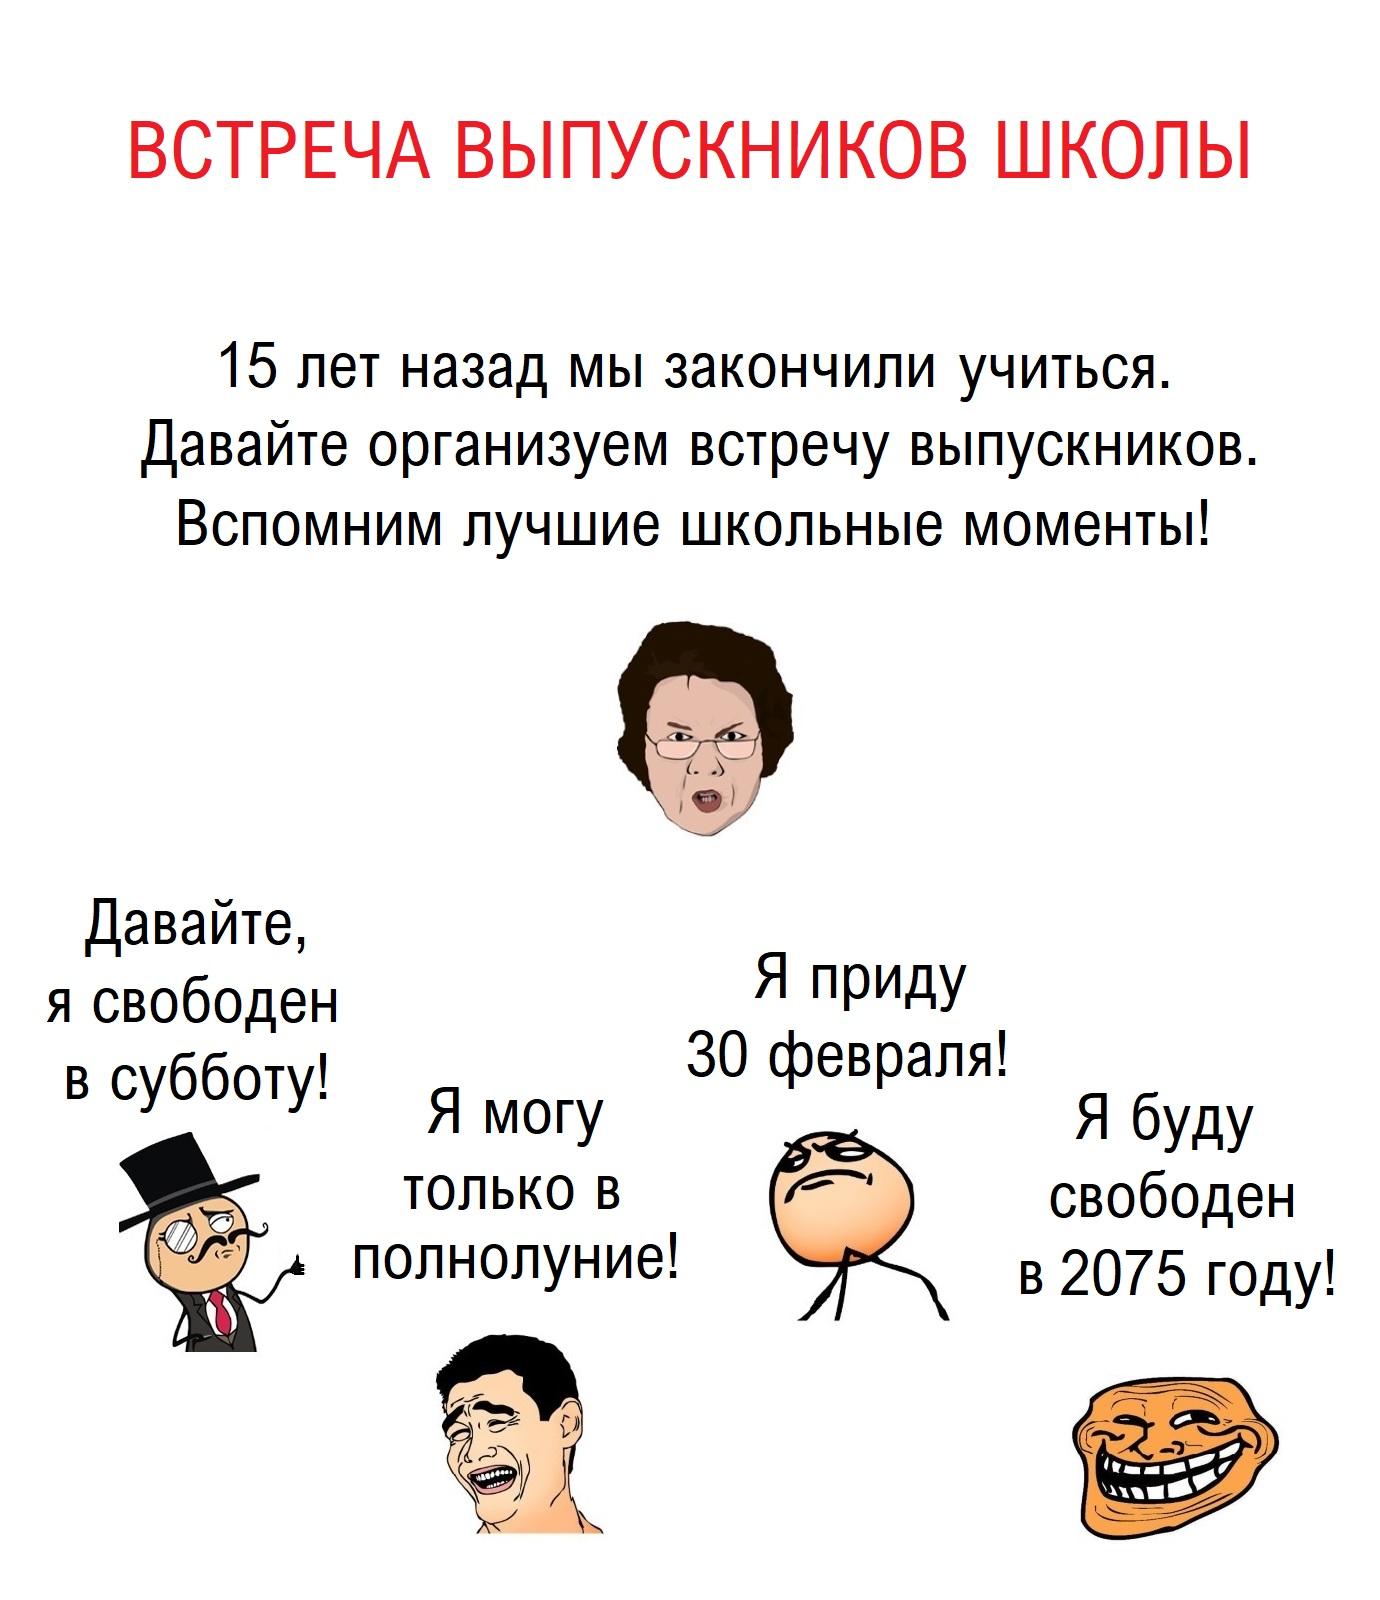 FBhMy5_yhAM.jpg